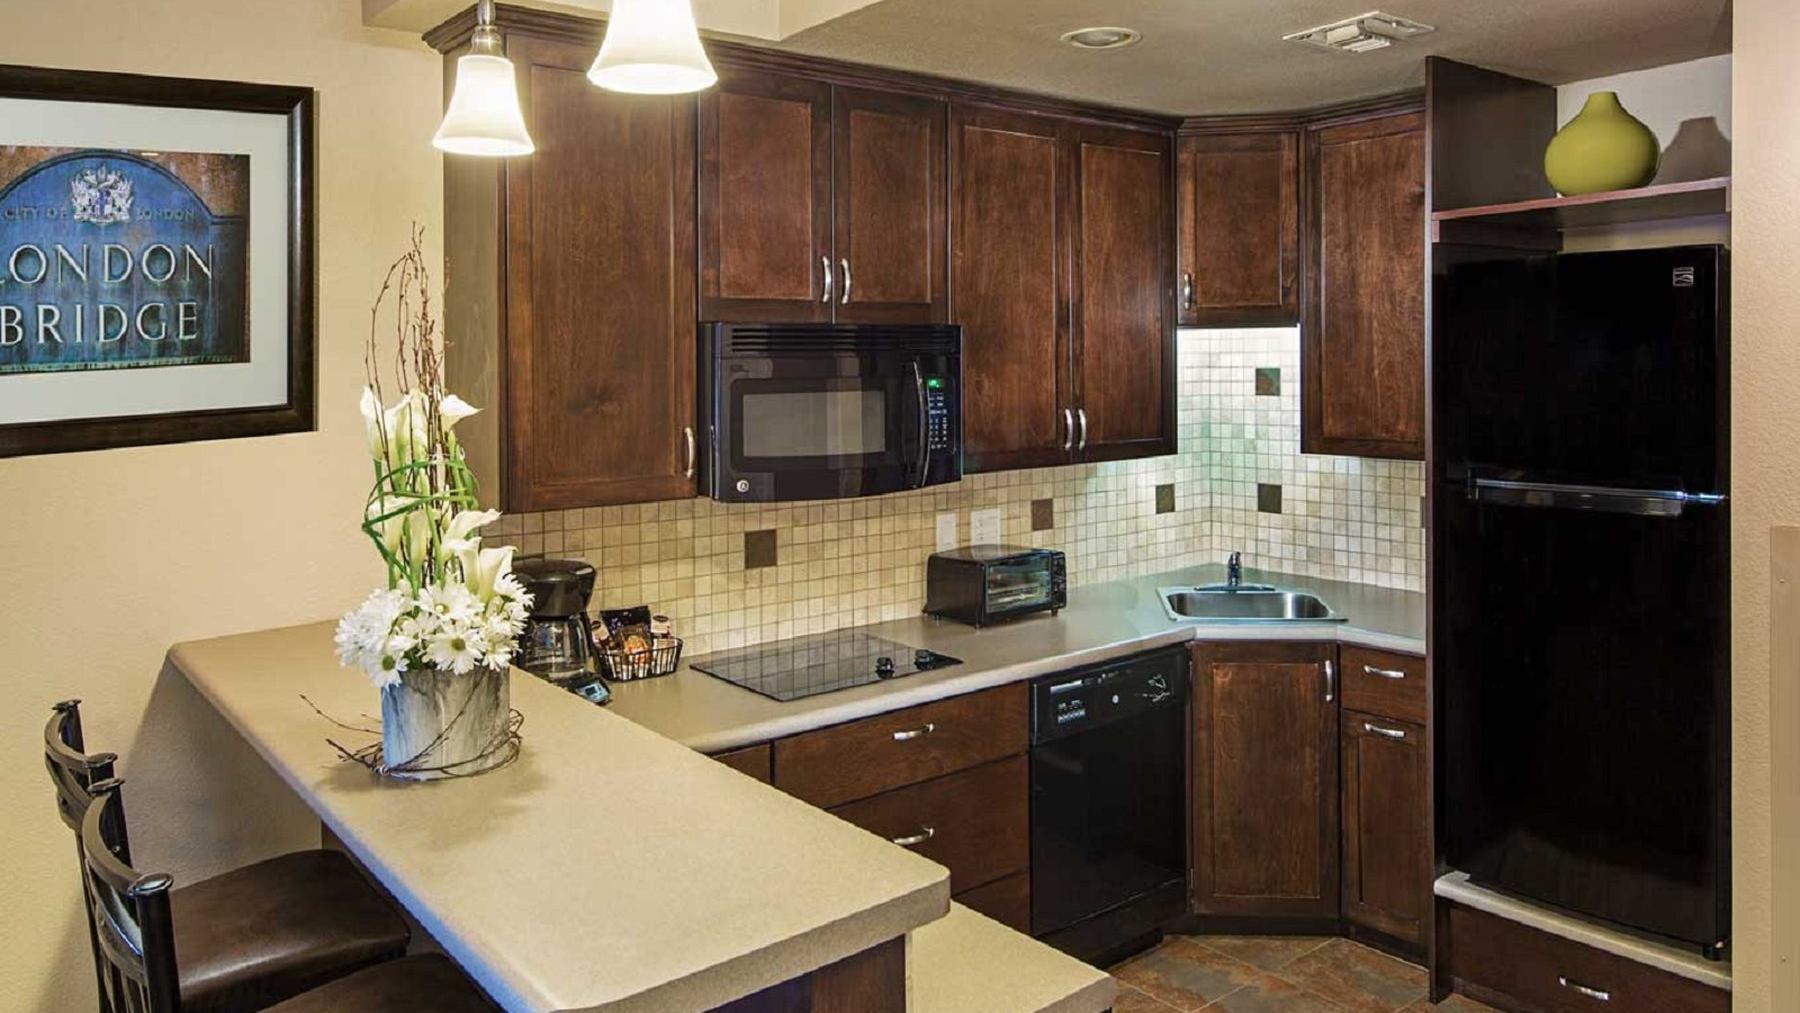 Resort suite kitchenette with bar.